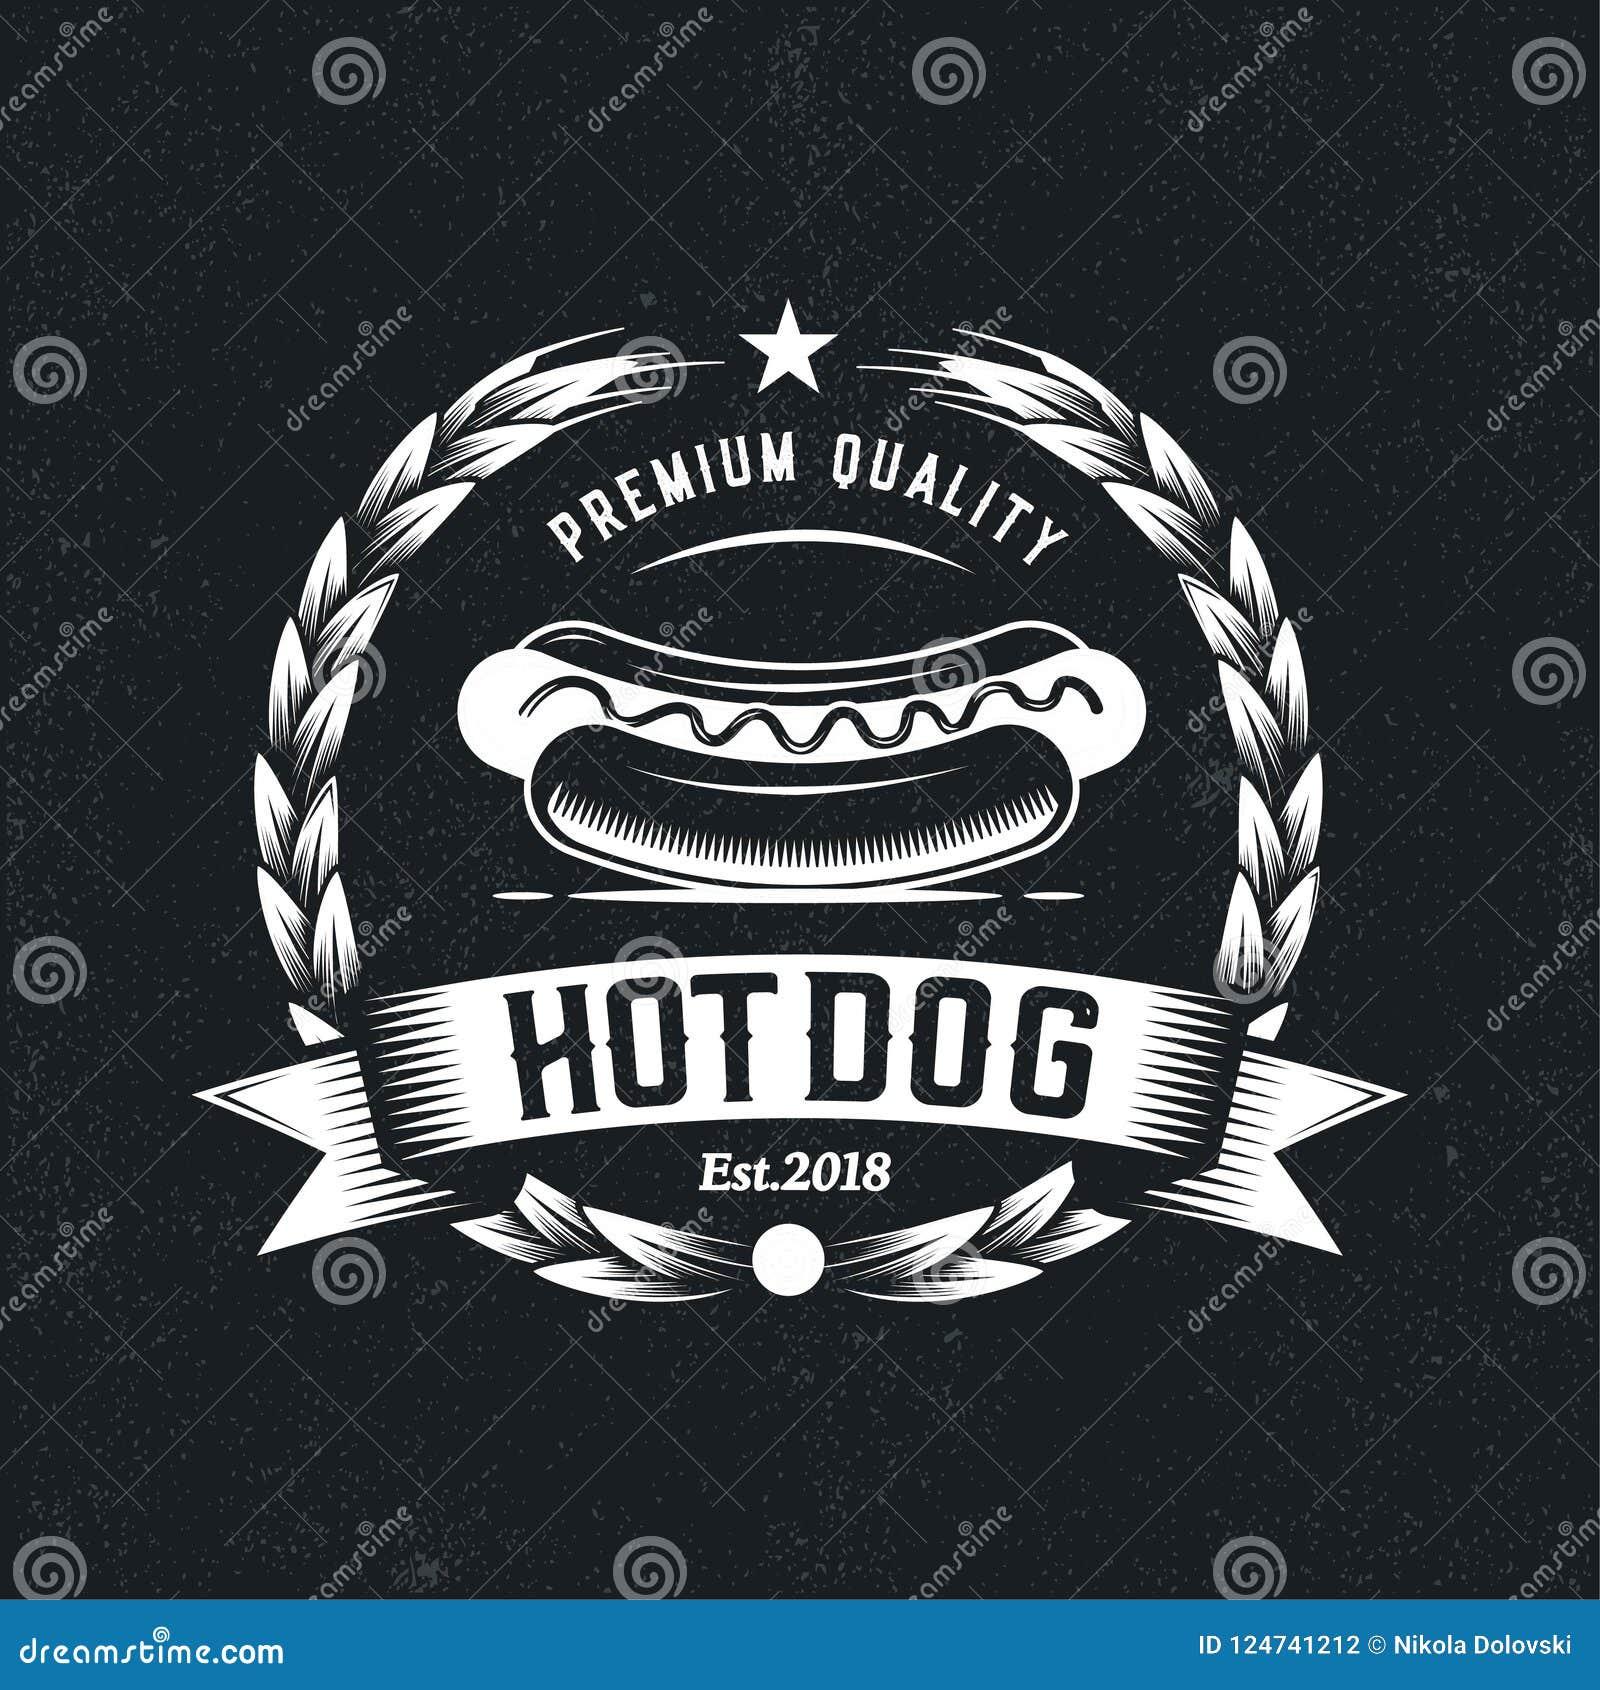 Retro Hot Dog Logo Fast Food Badge Illustration Vector